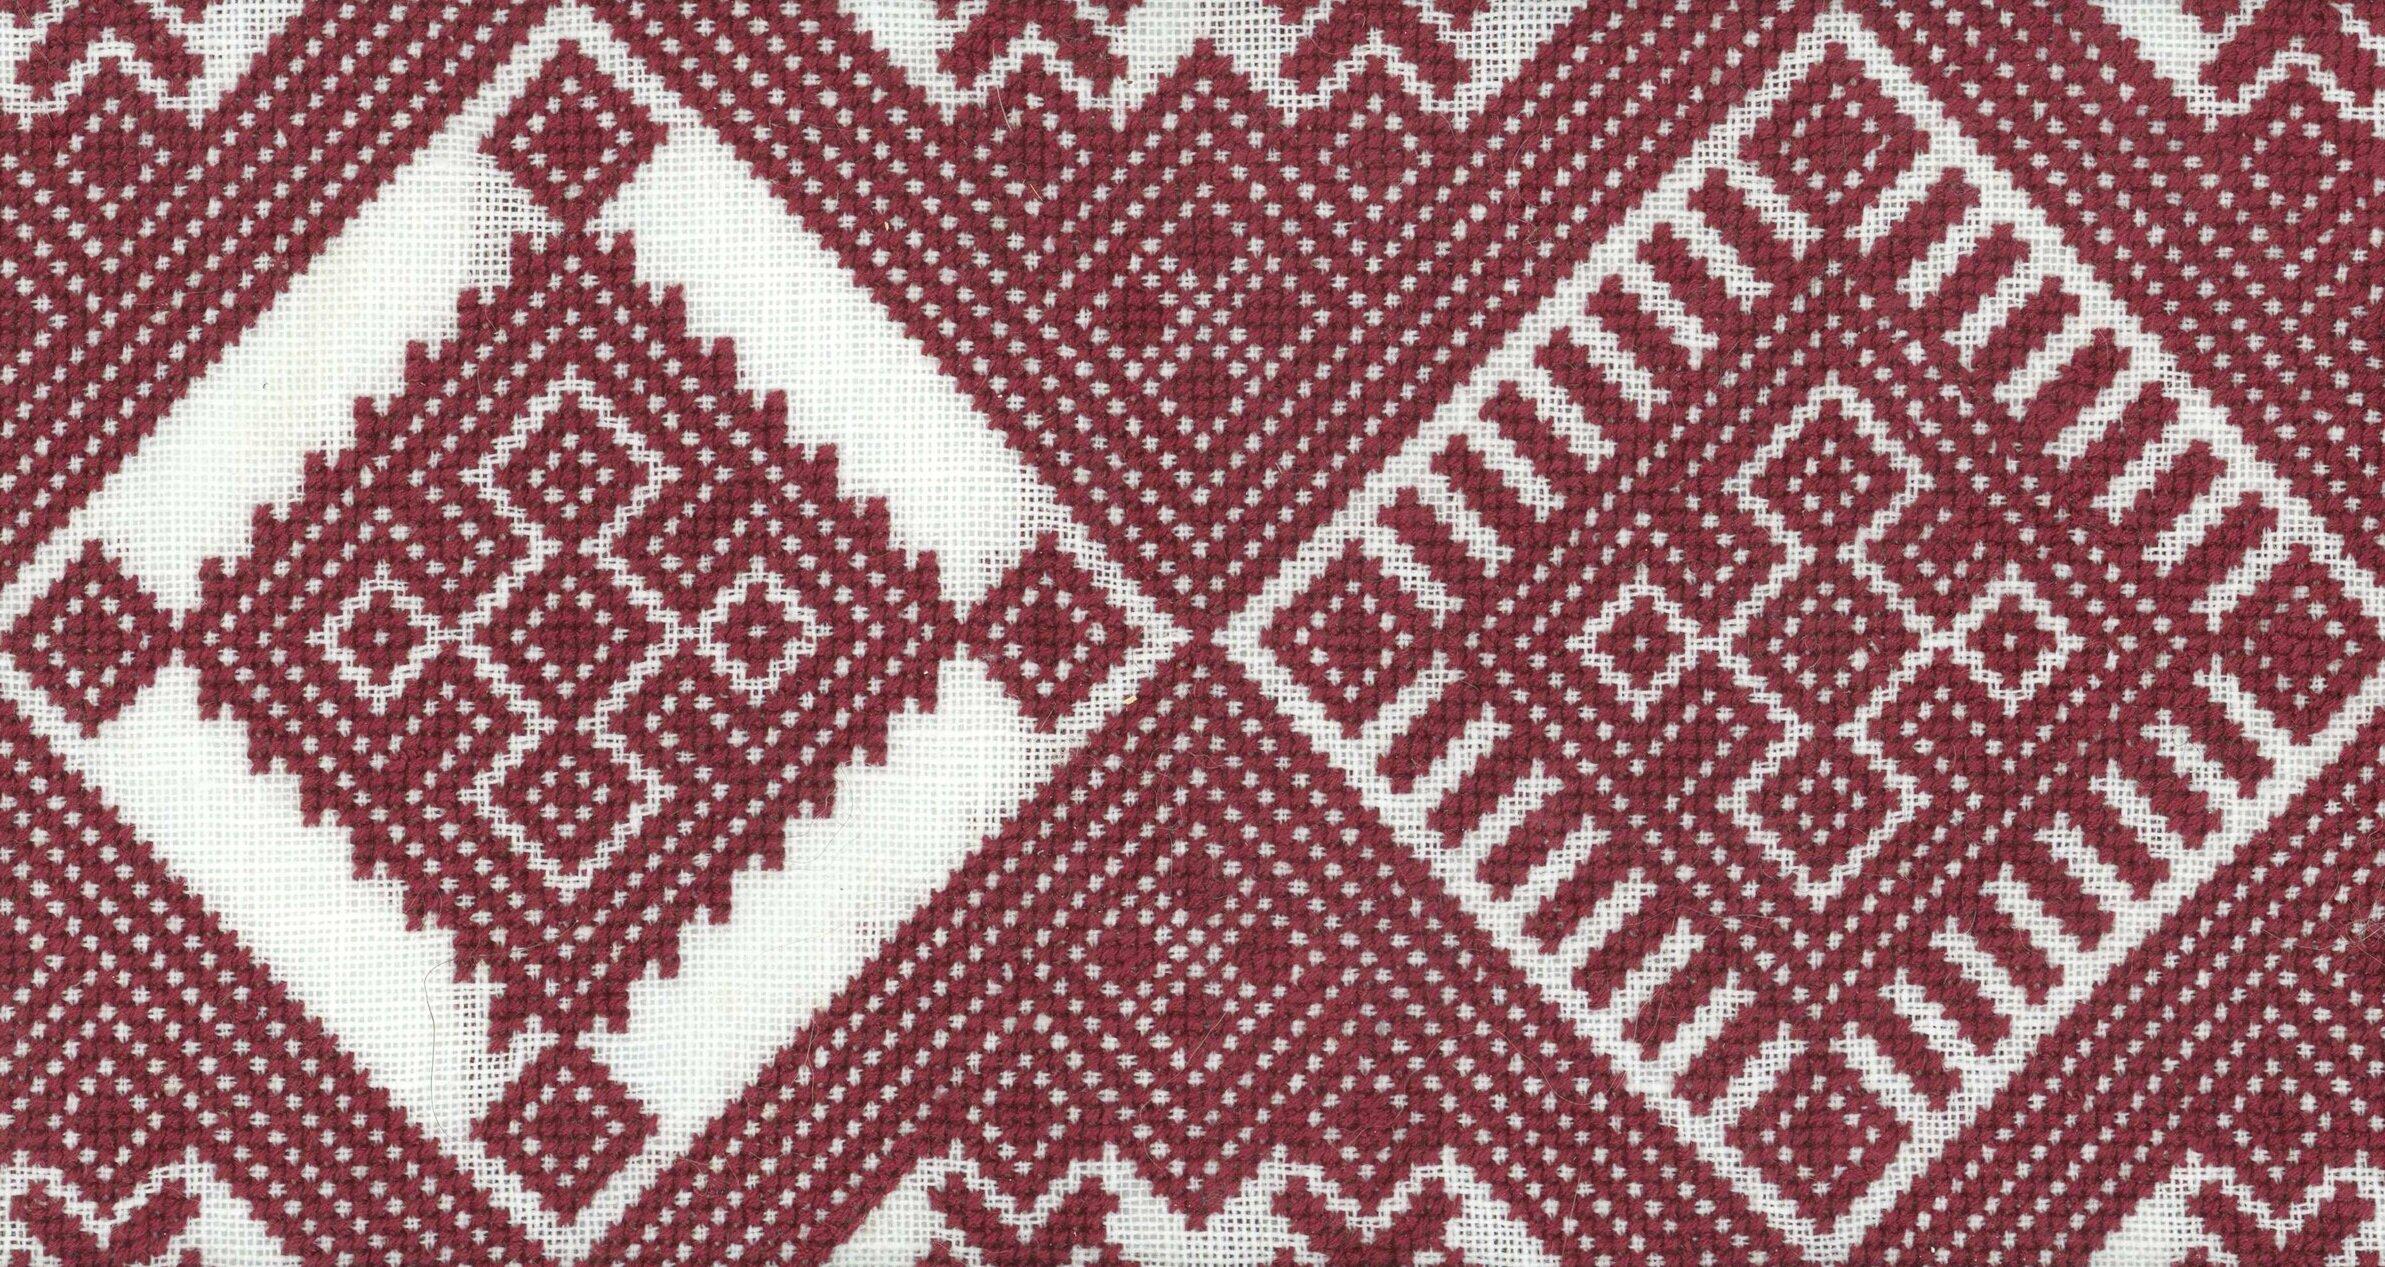 A variant on a traditional Ukranian cross stitch pattern.